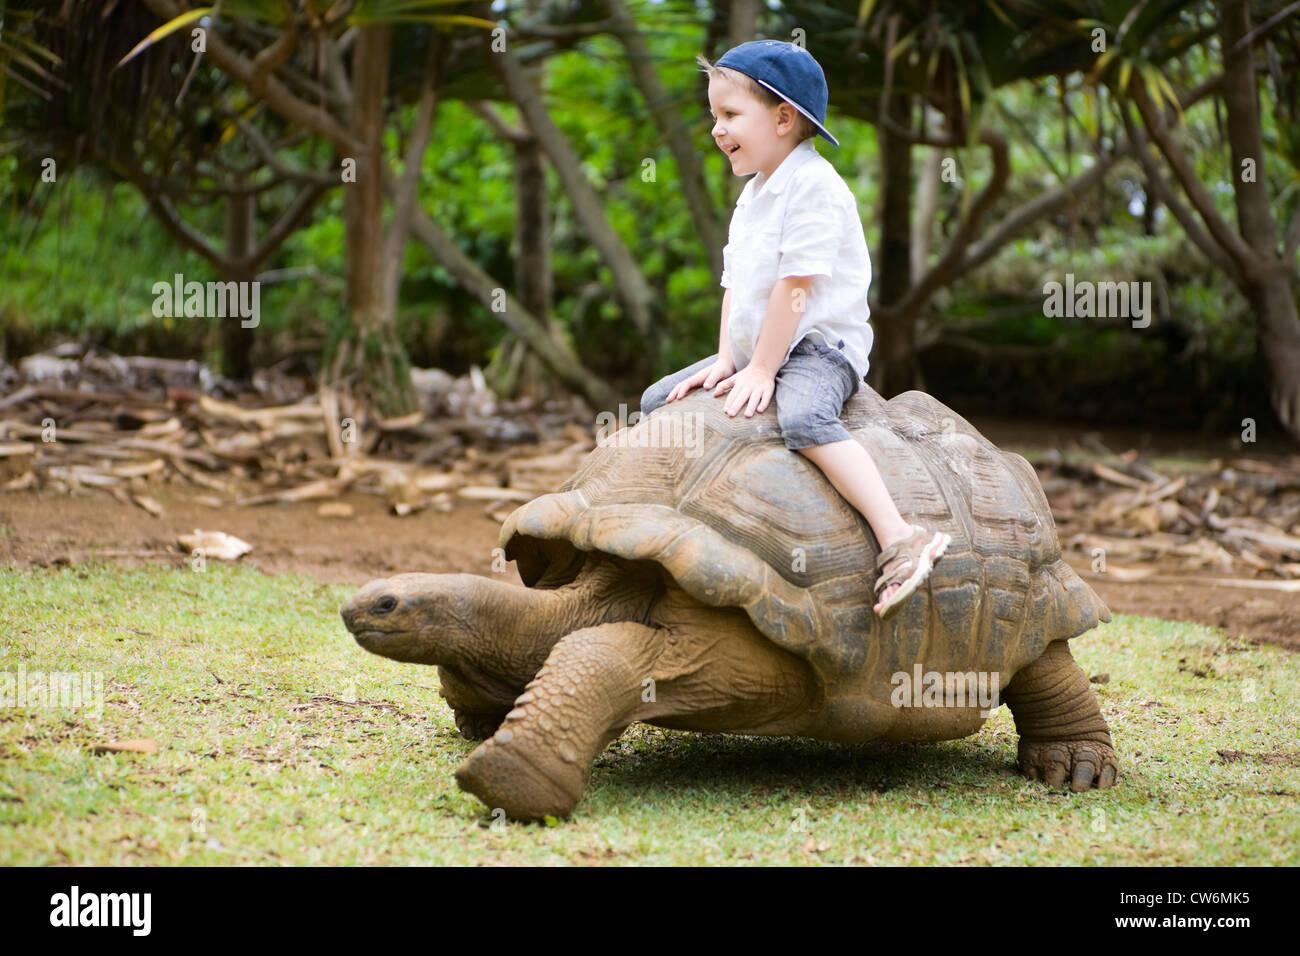 Seychelles giant tortoise, Aldabran giant tortoise, Aldabra giant tortoise (Testudo gigantea, Geochelone gigantea, - Stock Image